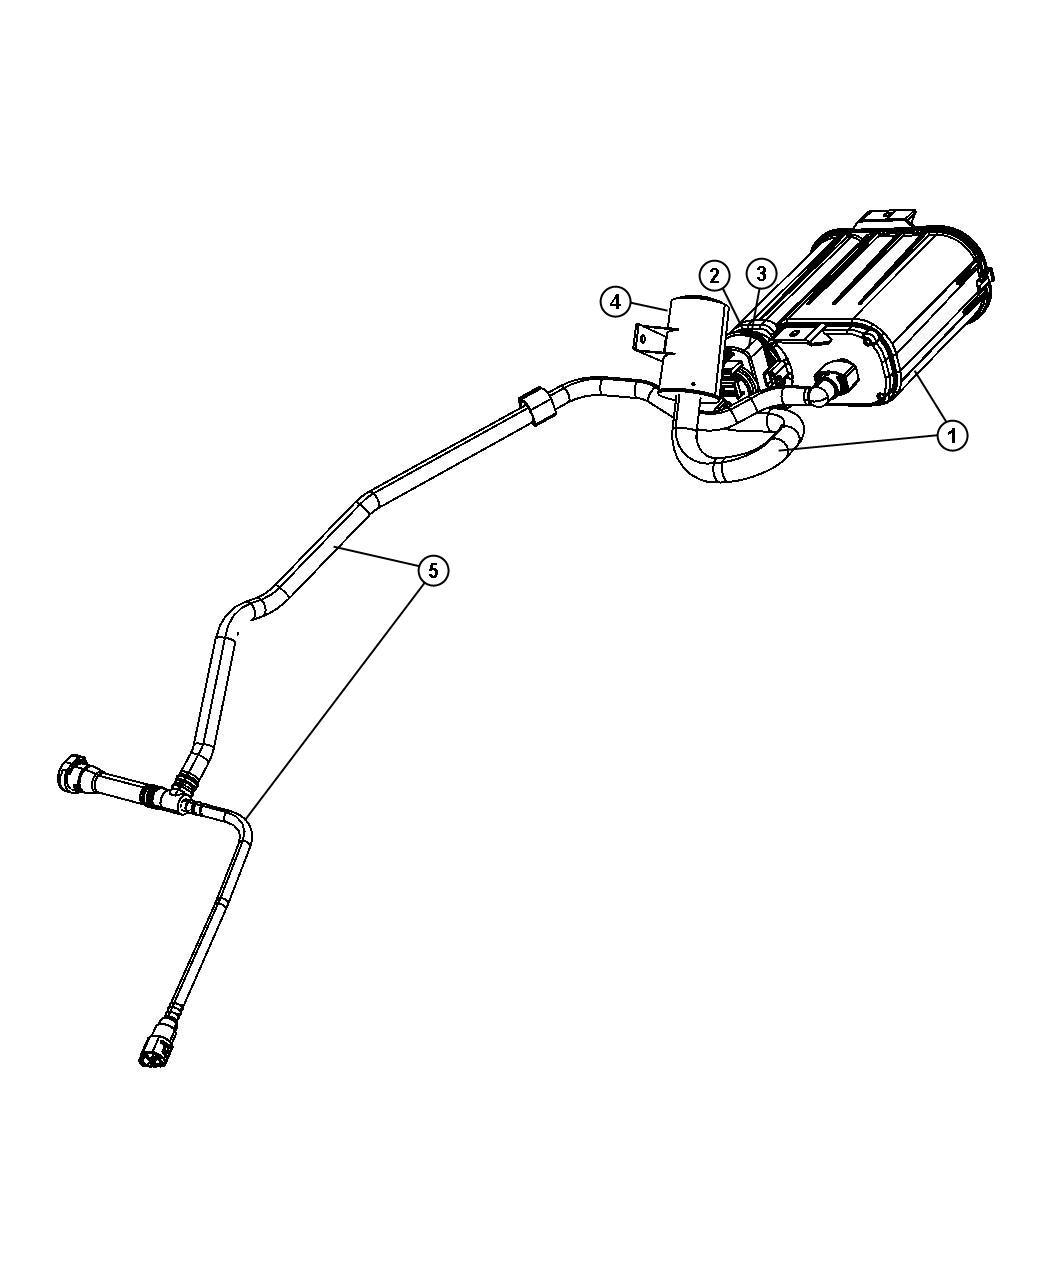 2008 Dodge Avenger Vapor Canister and Leak Detection Pump.